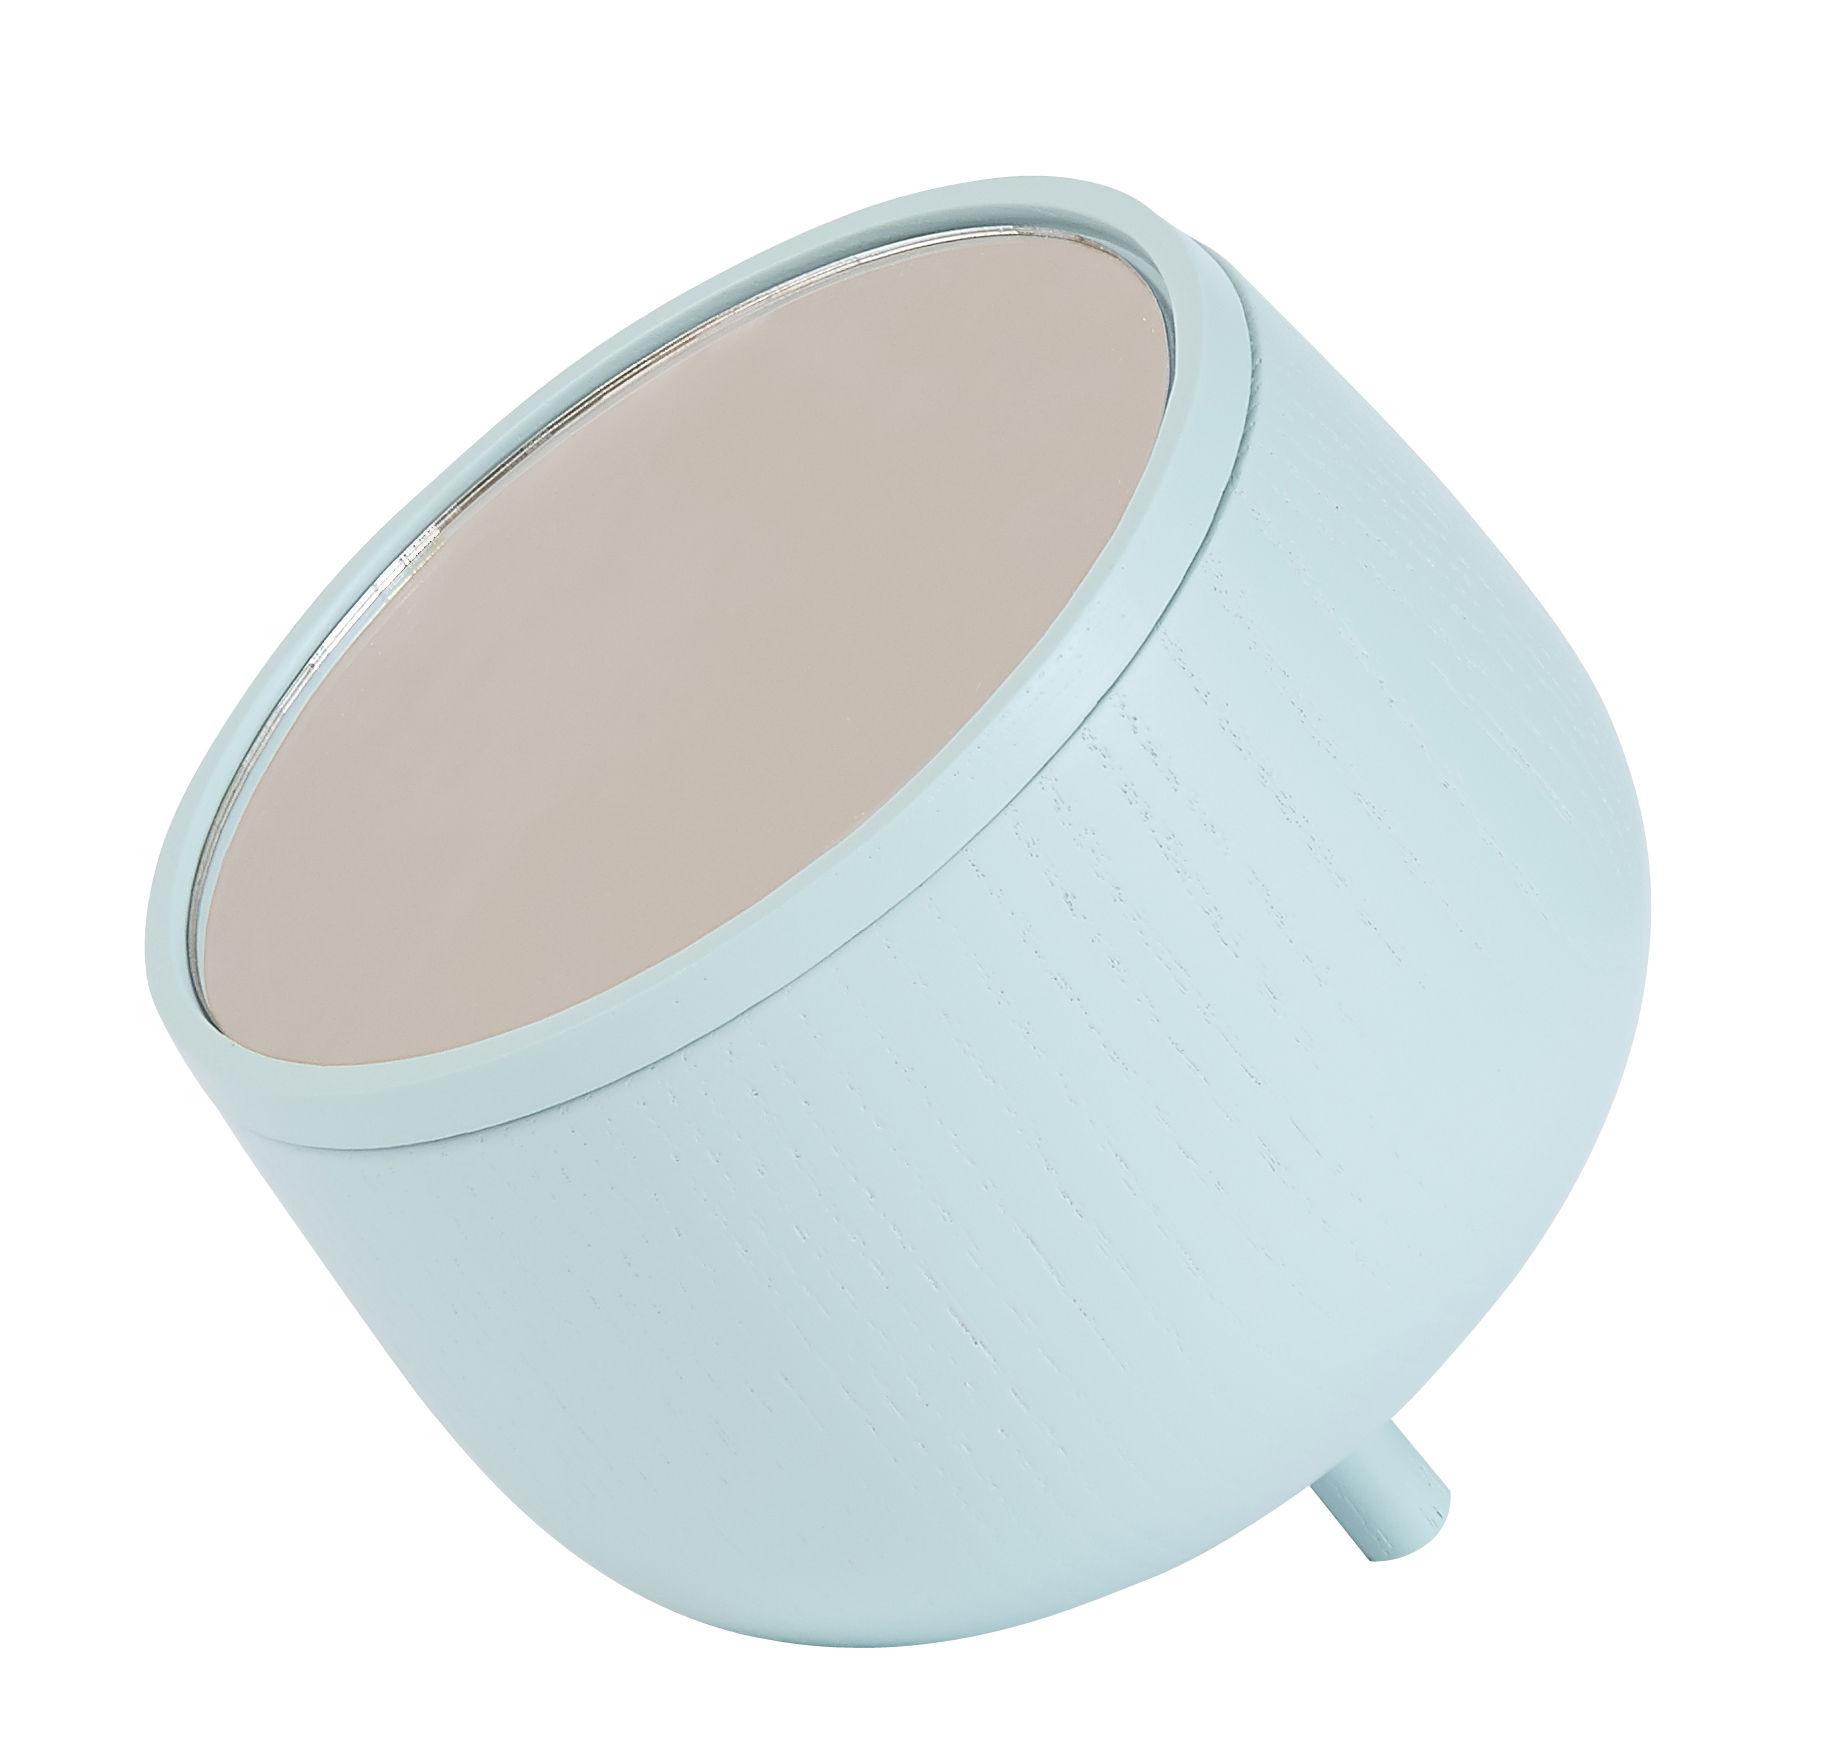 Déco - Boîtes déco - Boîte Edmée / Miroir - Hartô - Bleu pastel - Frêne, Miroir